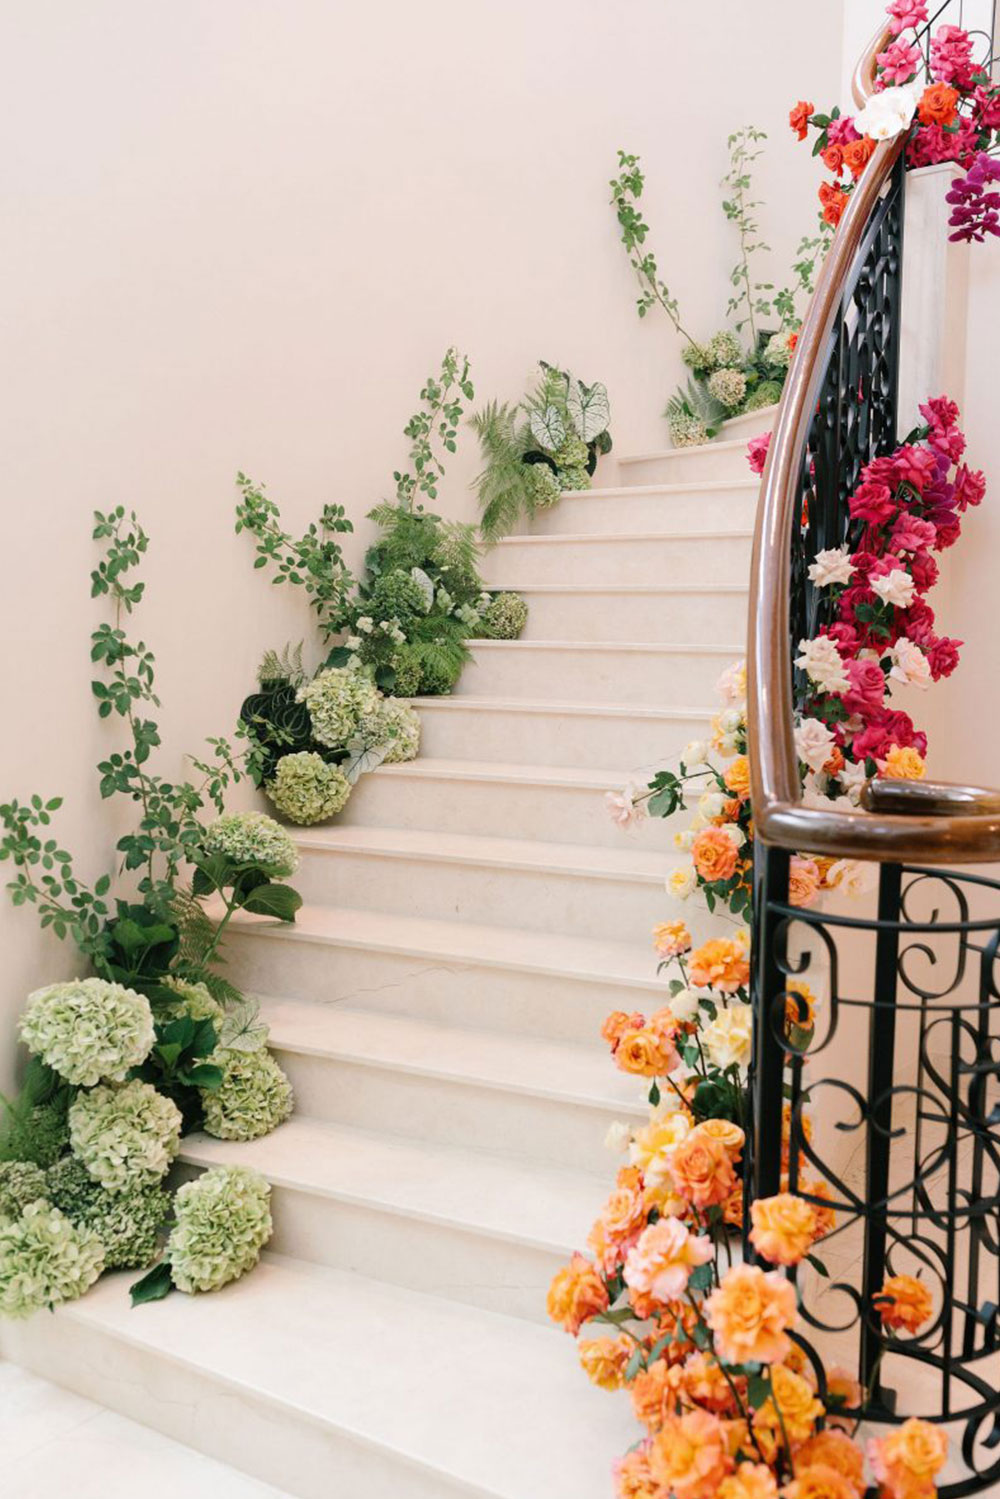 OliviaPalmer_MariaTommy_FlowerPalette.jpg